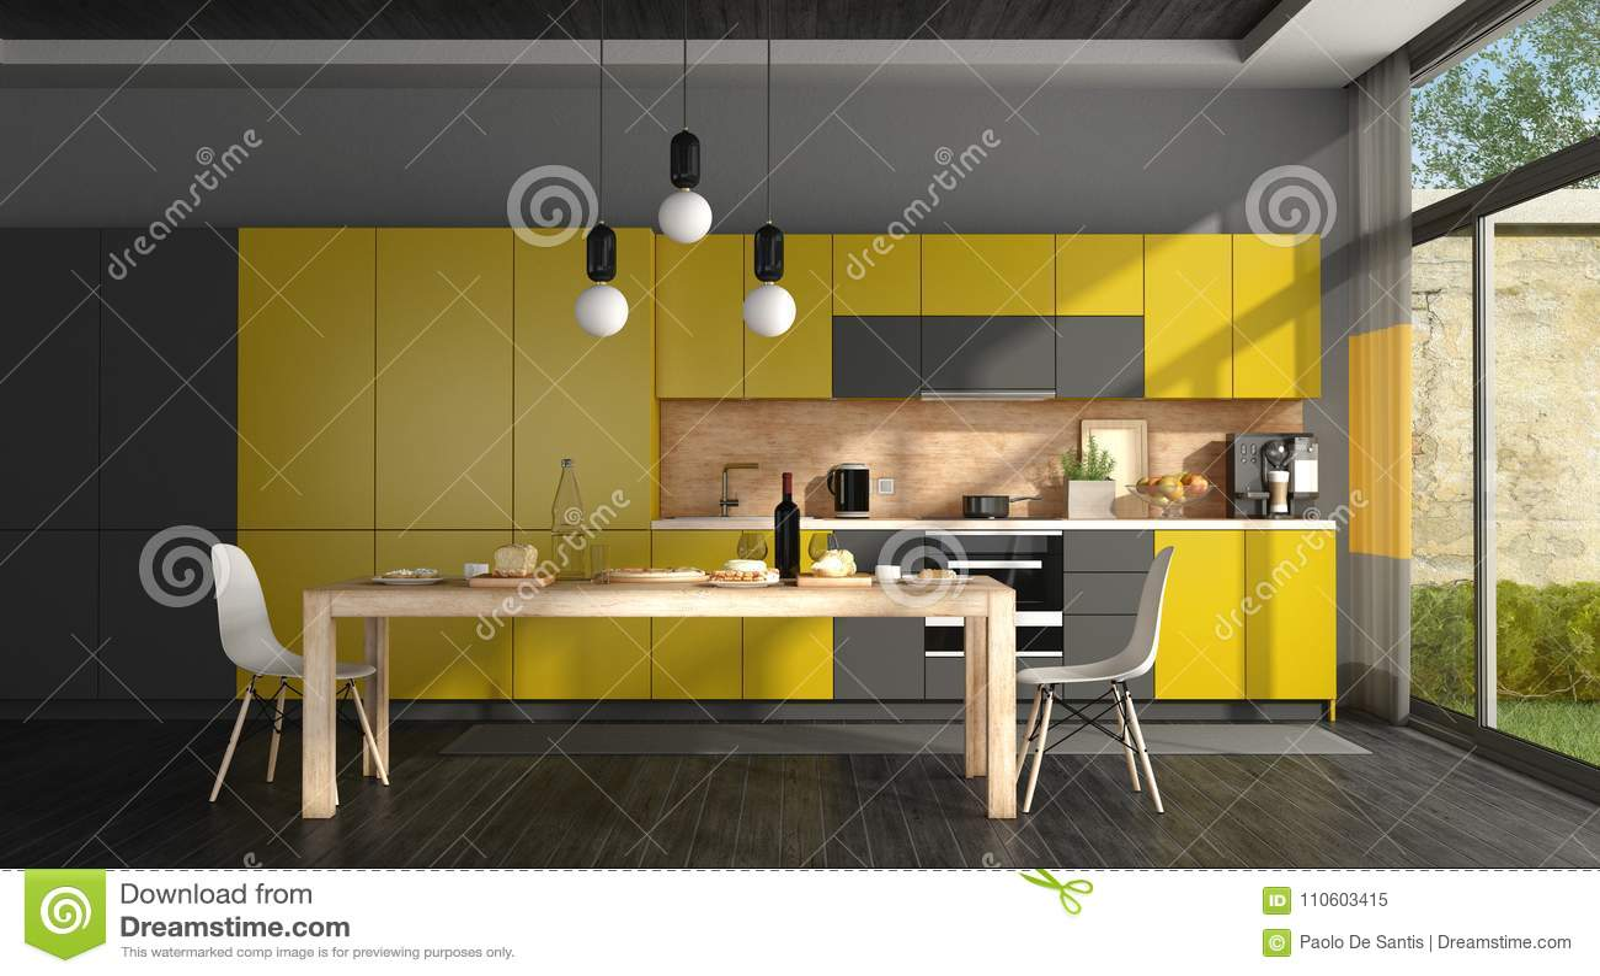 Cuisine Moderne Jaune cuisine moderne noire et jaune illustration stock - illustration du